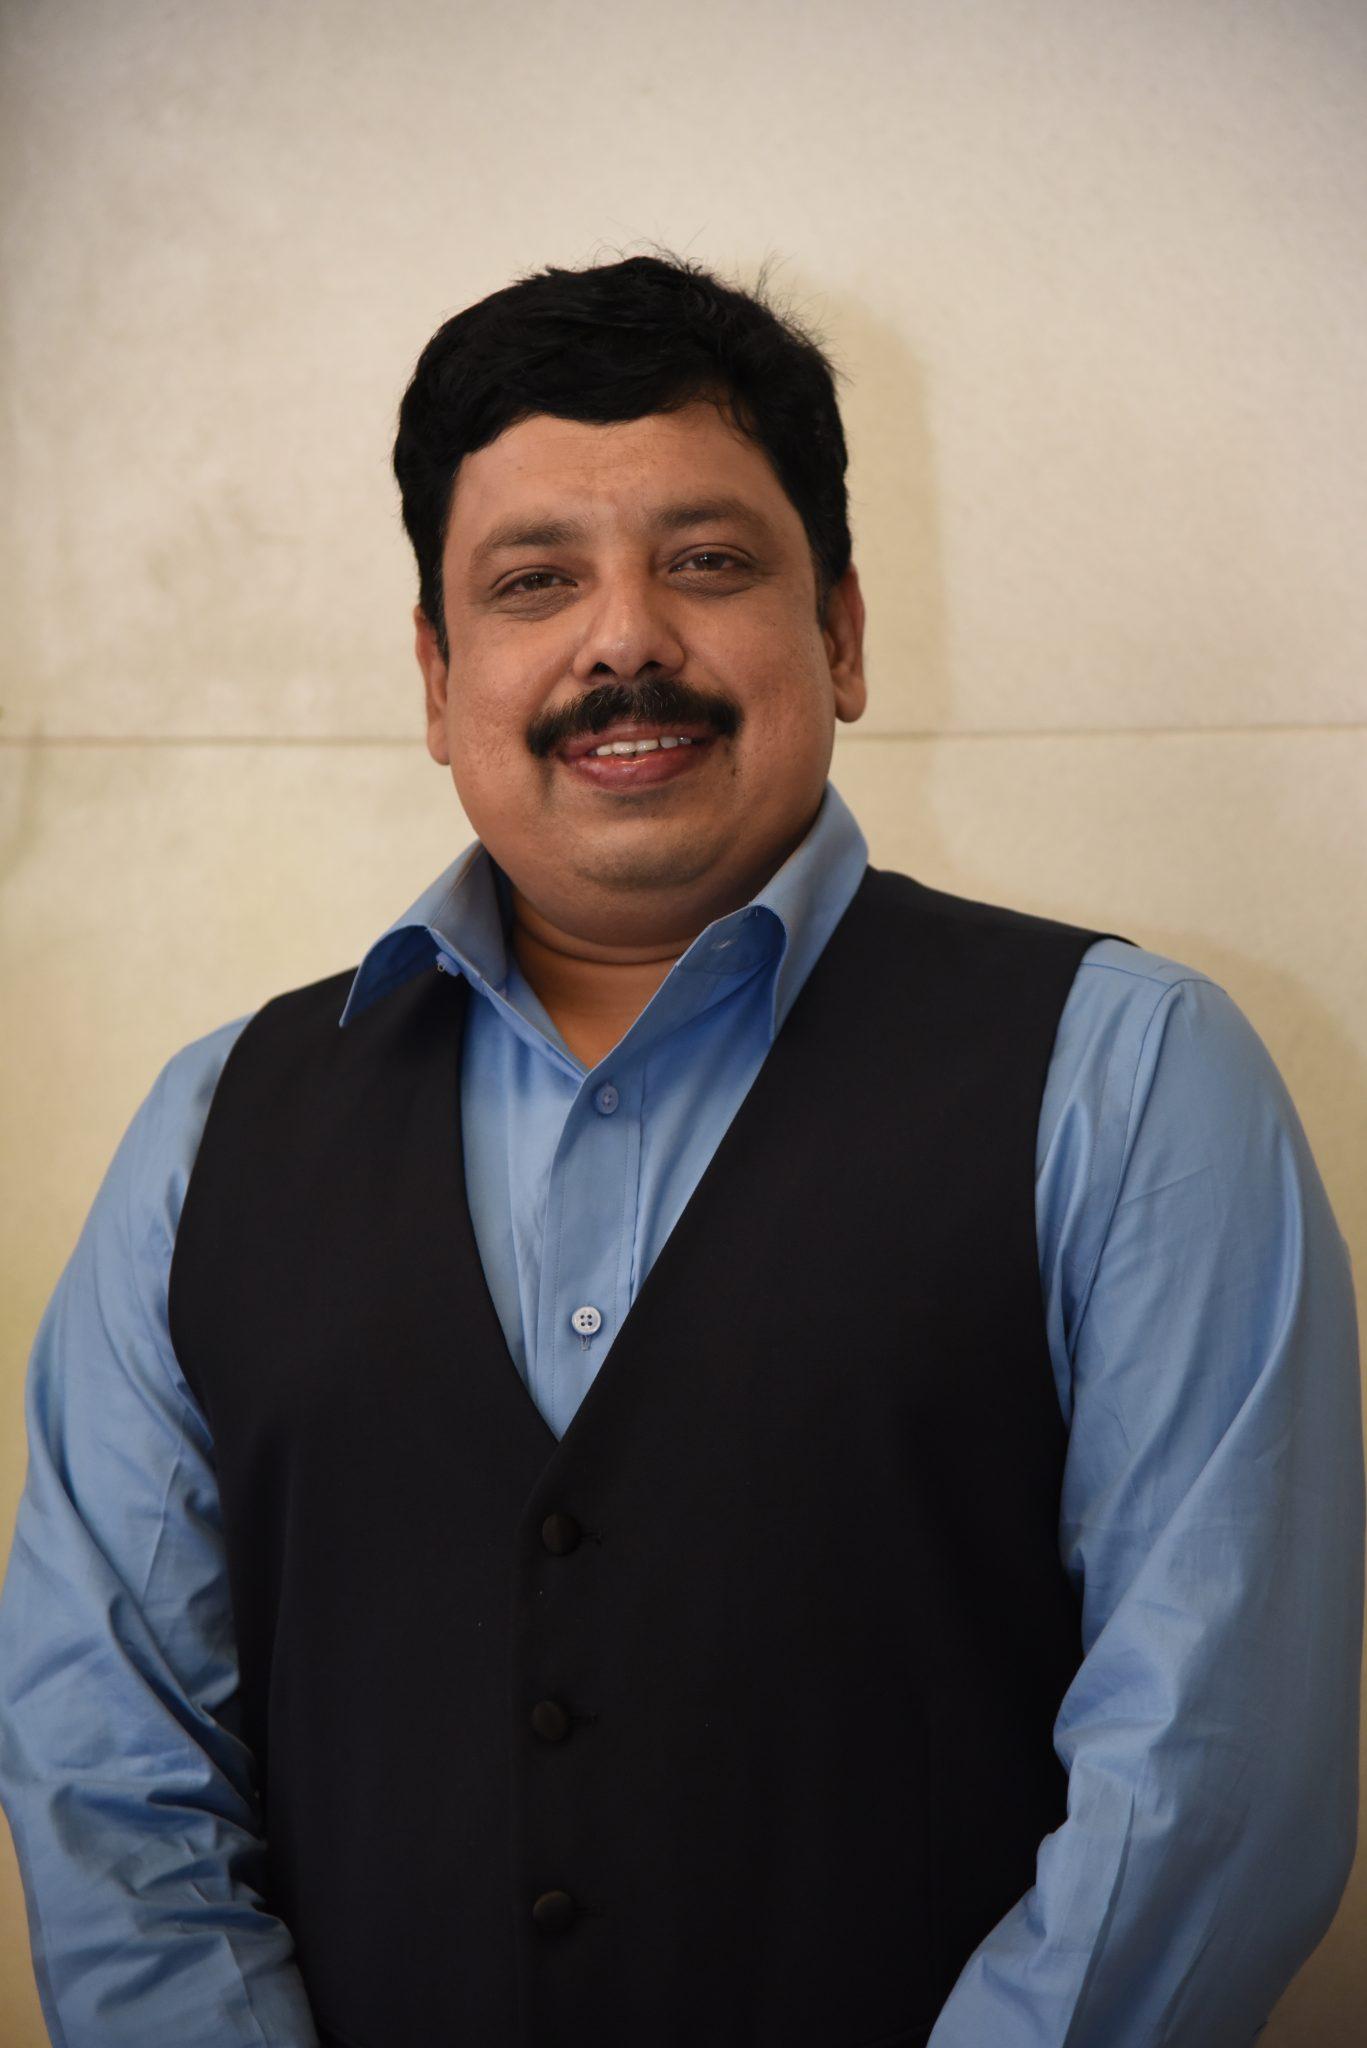 Anand Neelakantan